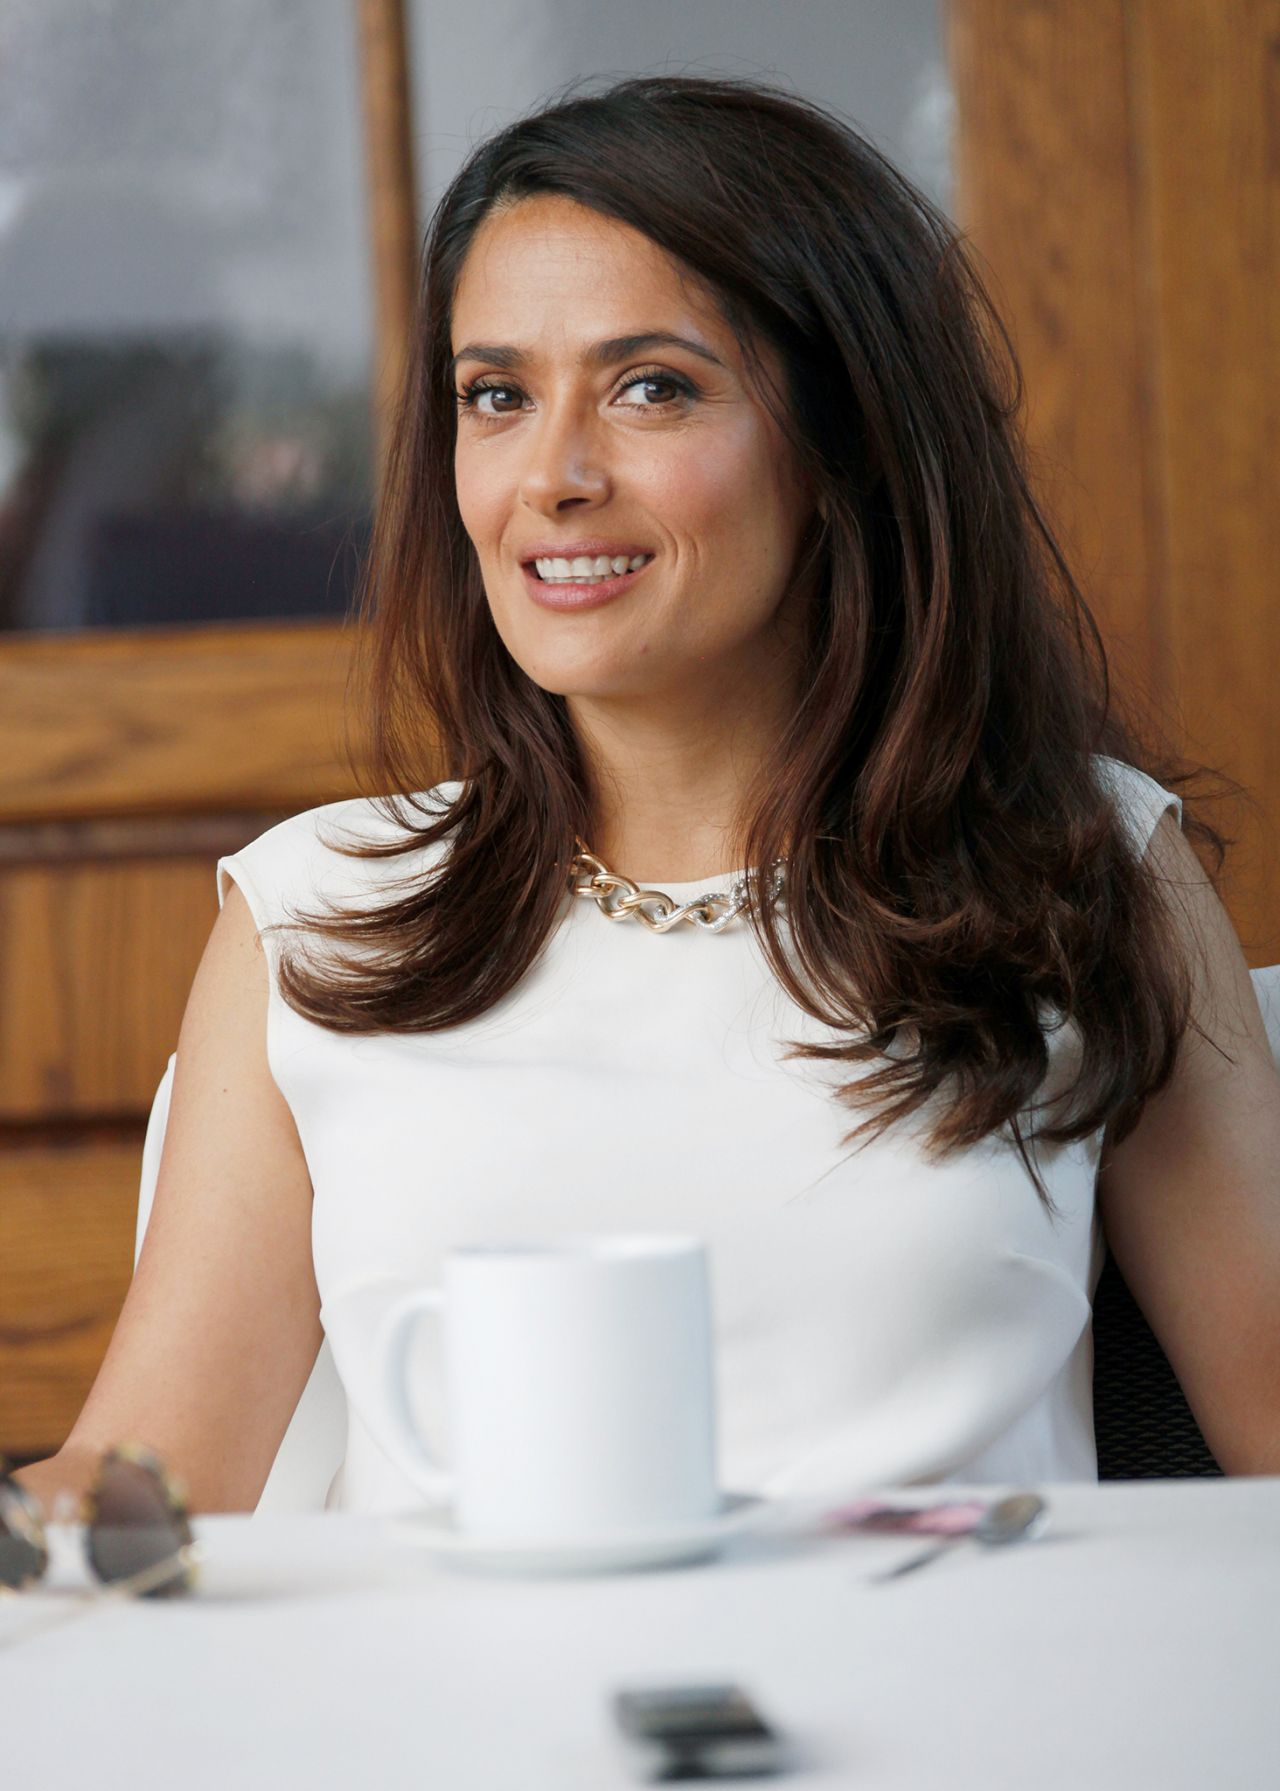 Salma Hayek The Prophet Press Conference Portraits